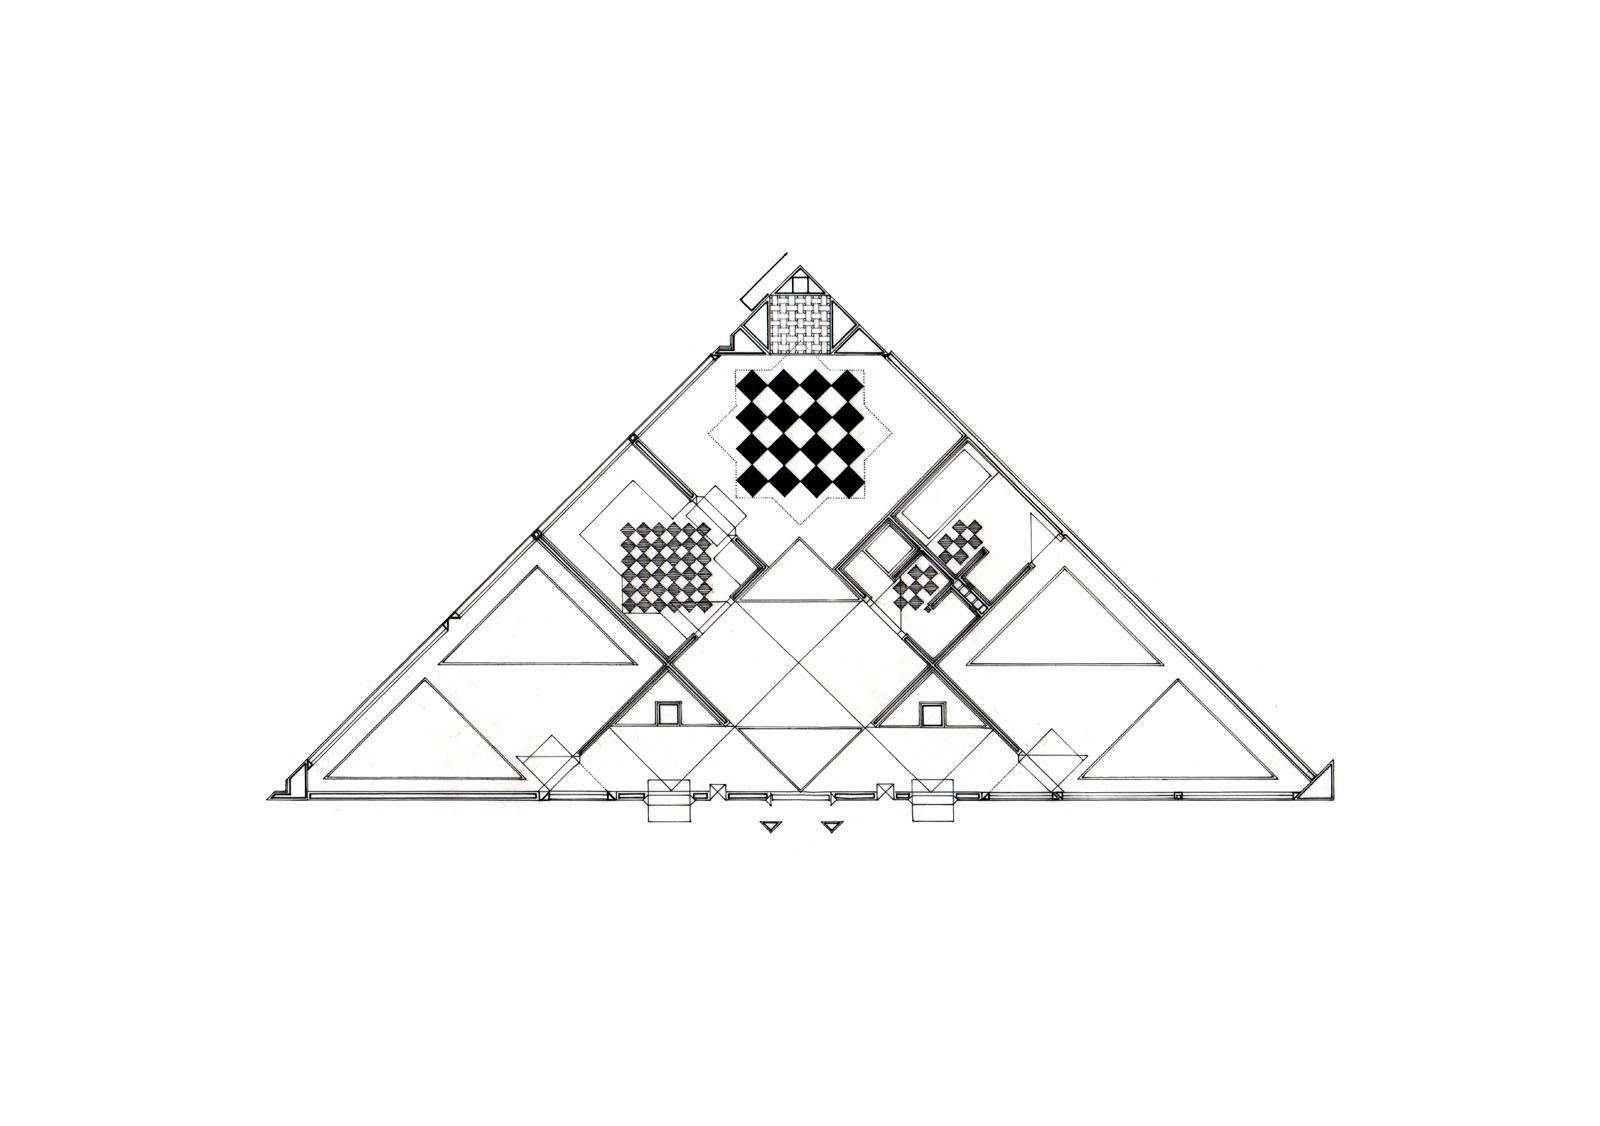 danielvillalobos-architecturexxthcentury-spanisharchitecture-schoolarchitectureproject-7